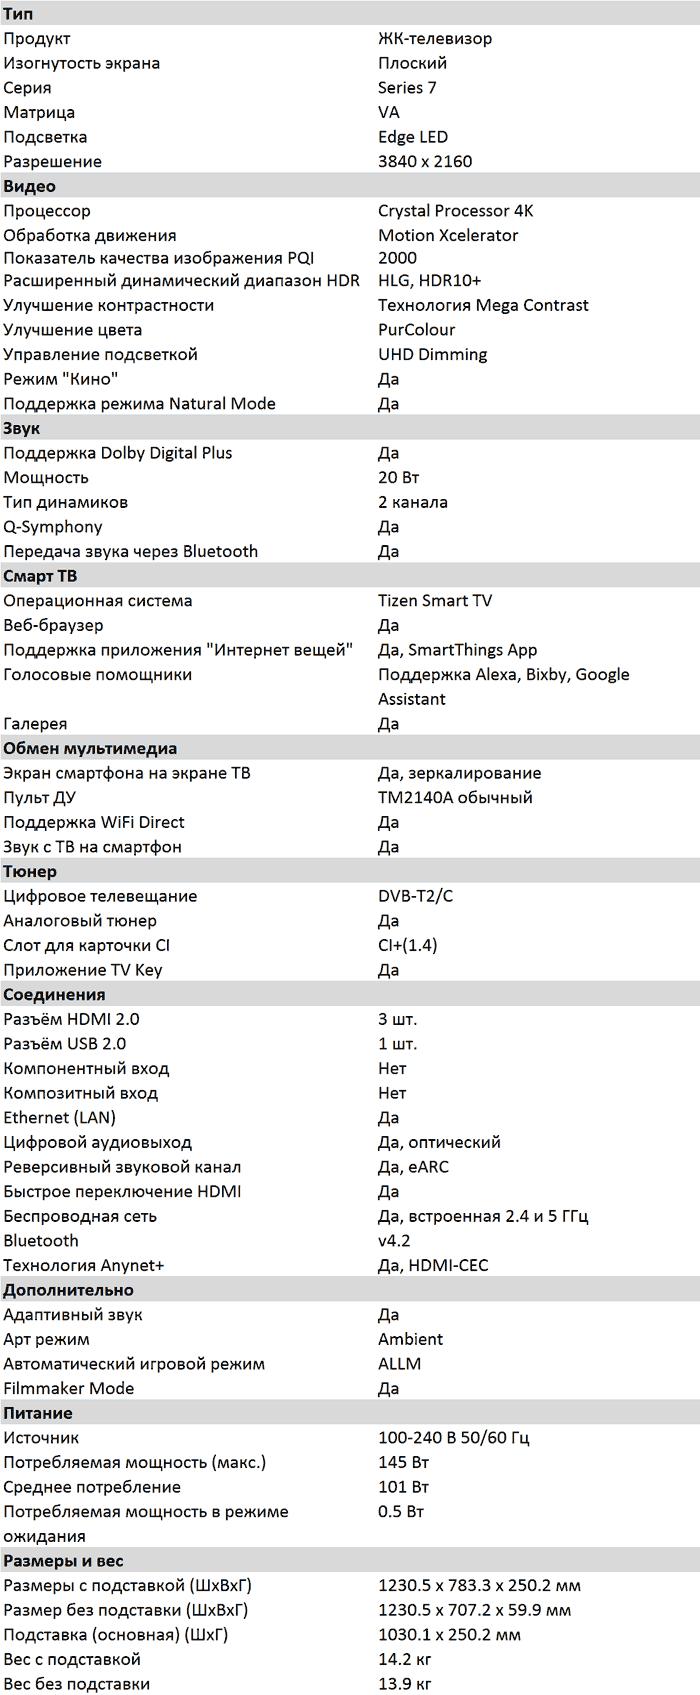 Характеристики AU7100